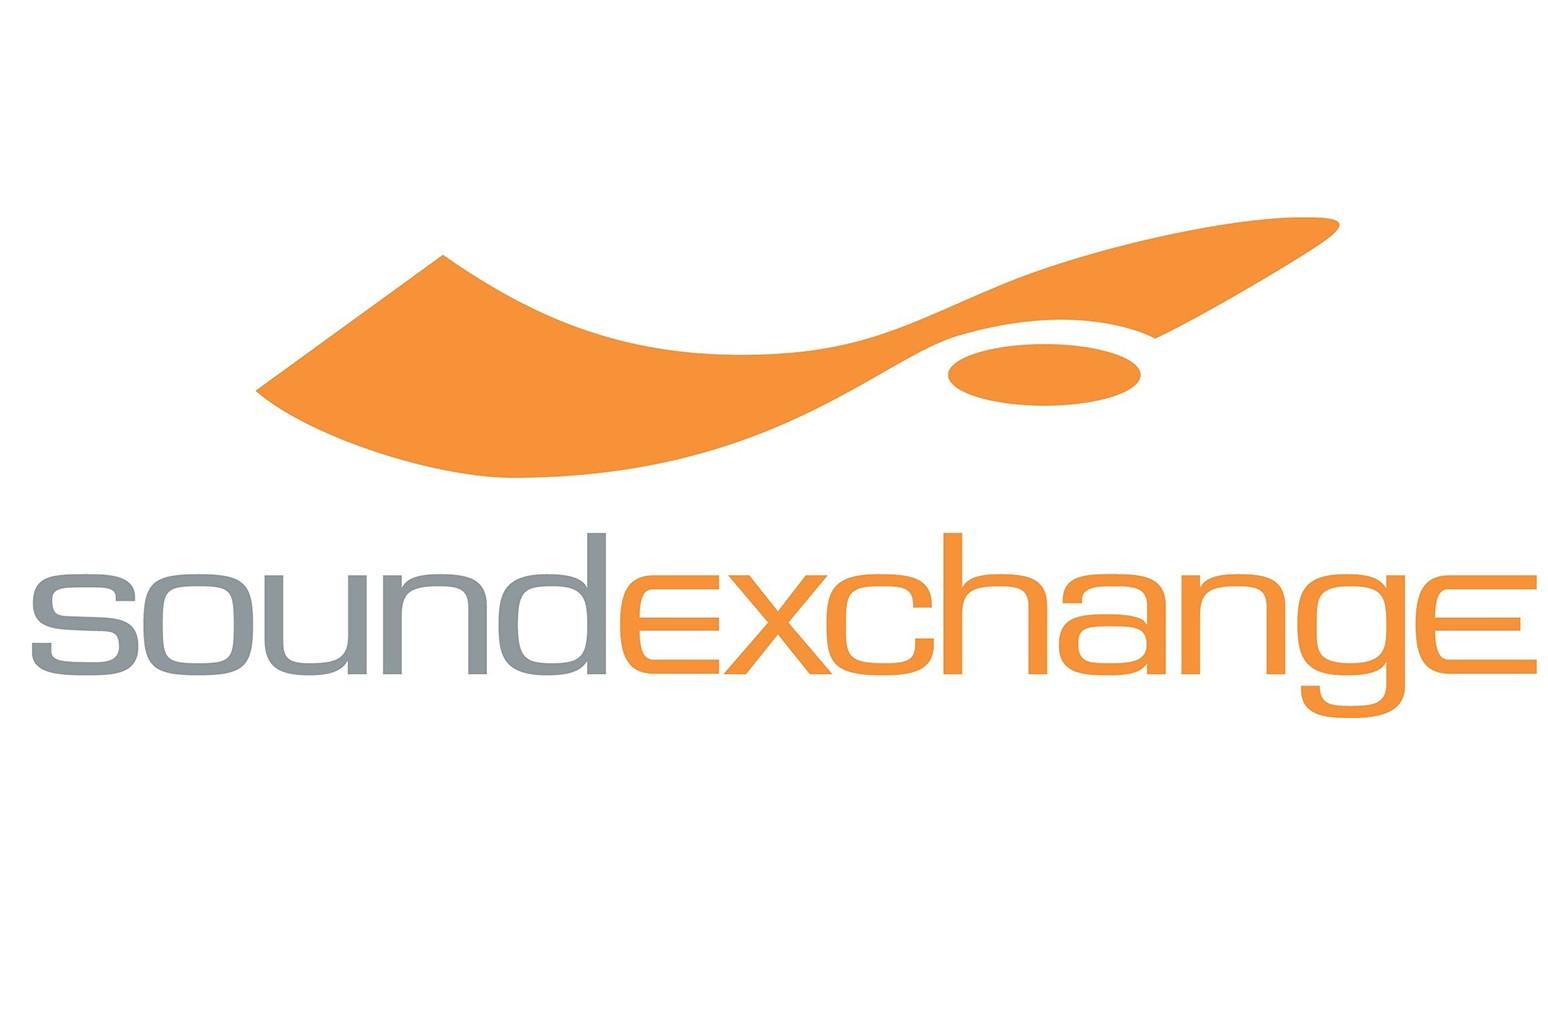 SoundExchange logo